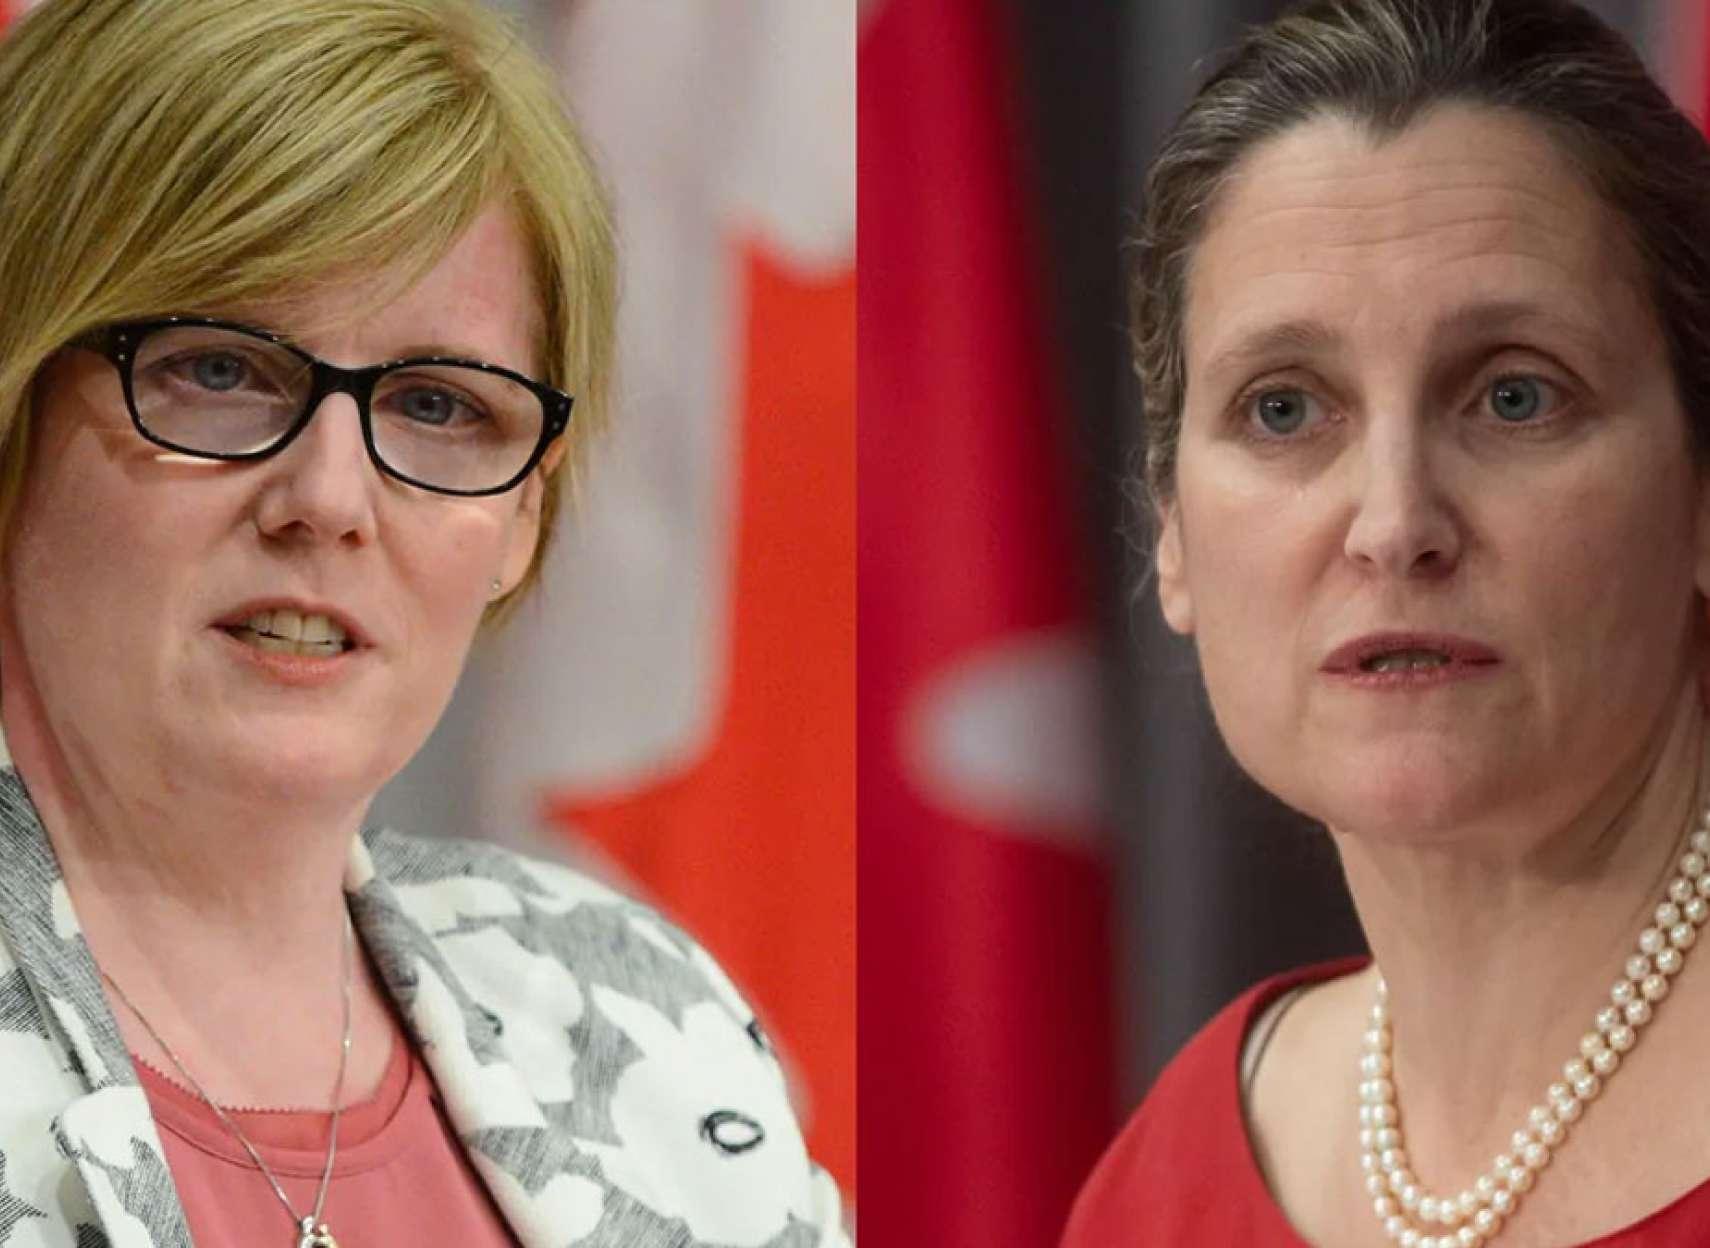 اخبار-کانادا-آخرین-تغییرات-کمک-های-ماهیانه-2000-دلاری-کانادا-دقیقا-چیست